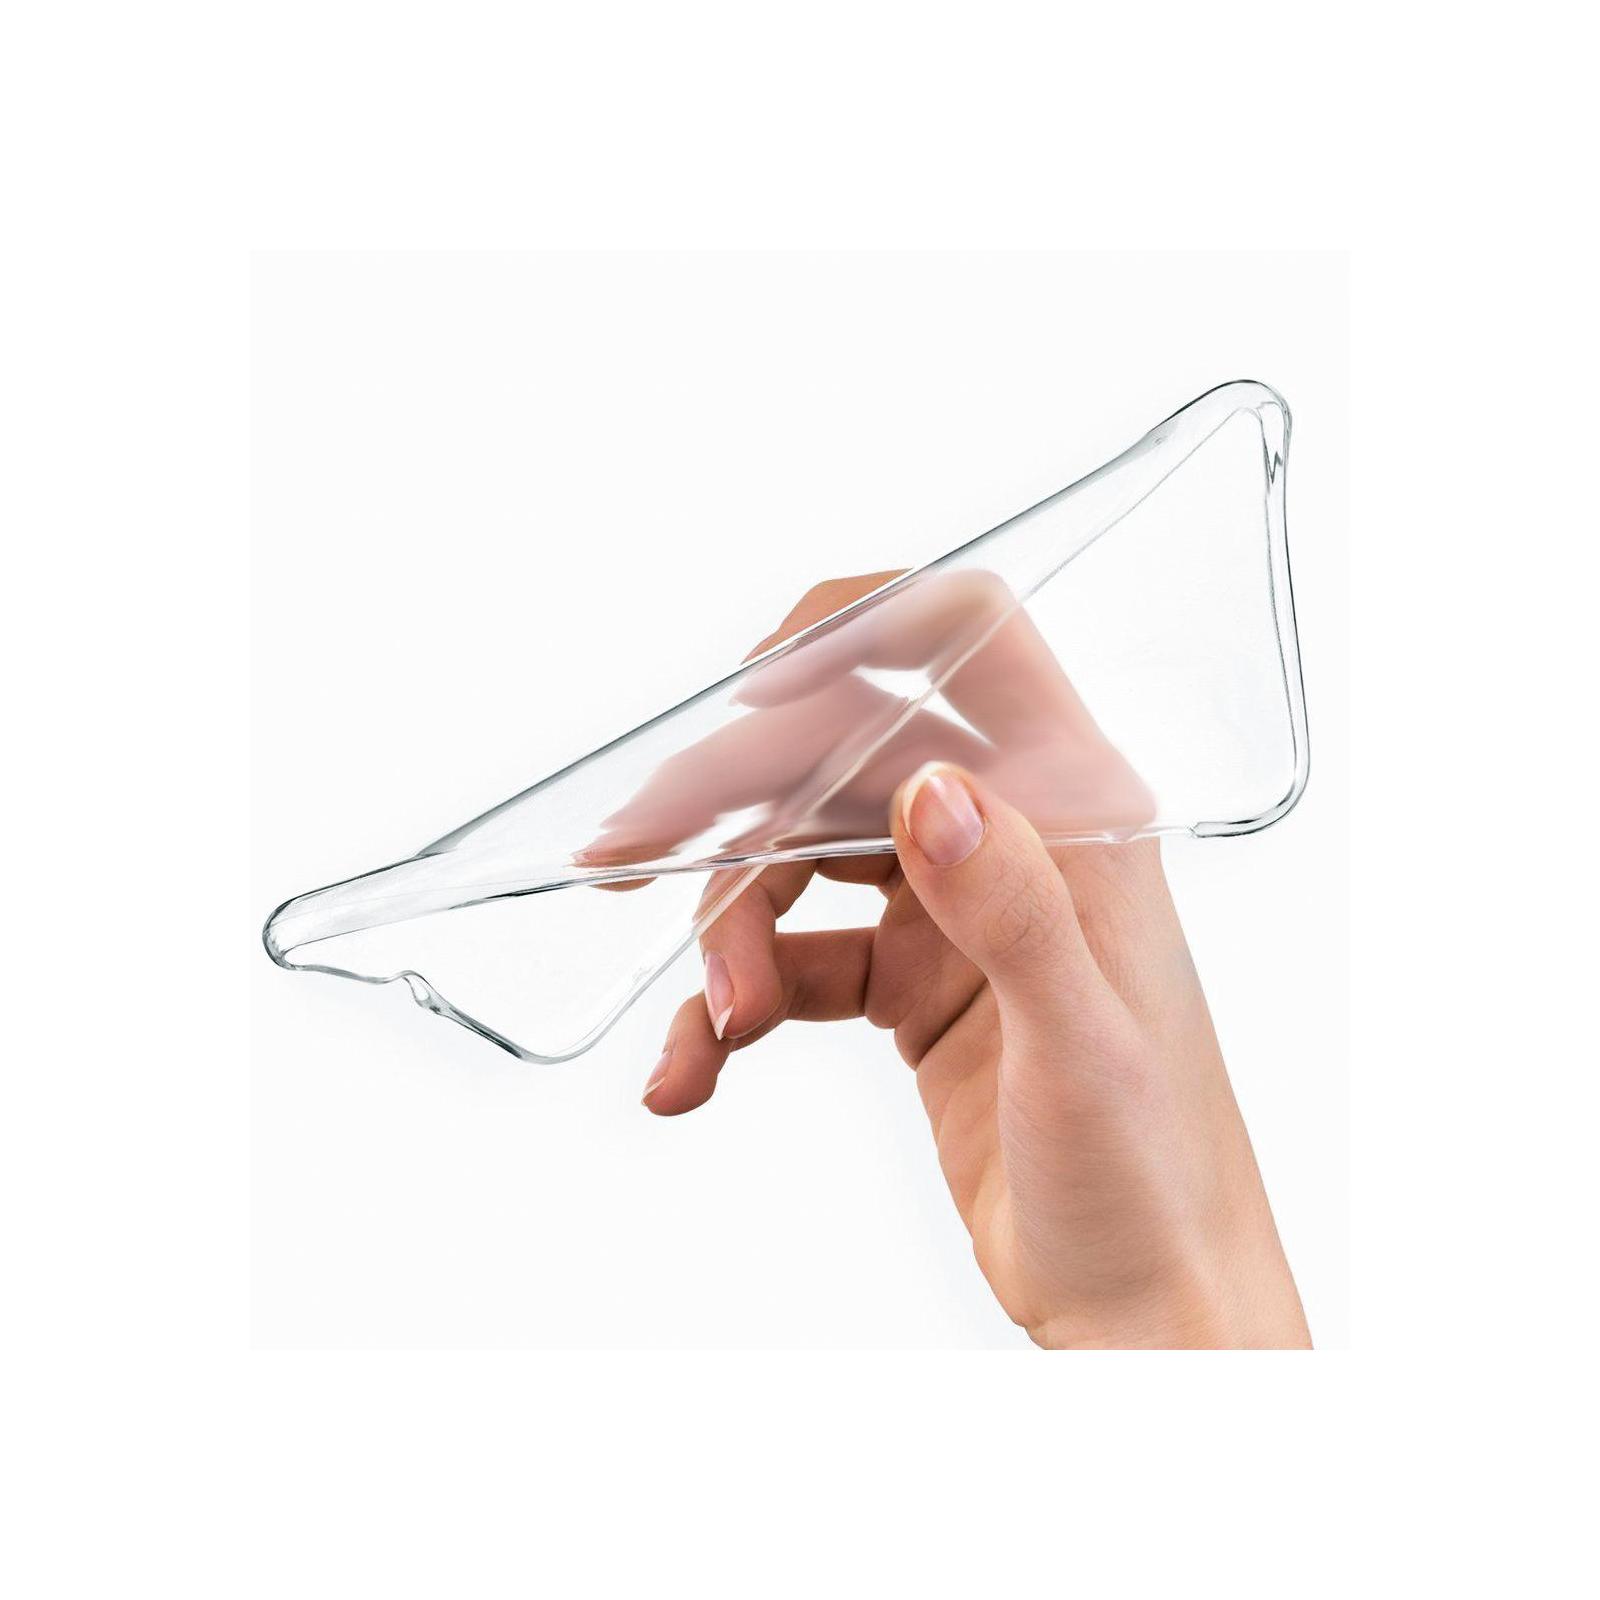 Чехол для моб. телефона SmartCase Samsung Galaxy A5 /A520 TPU Clear (SC-A5) изображение 6